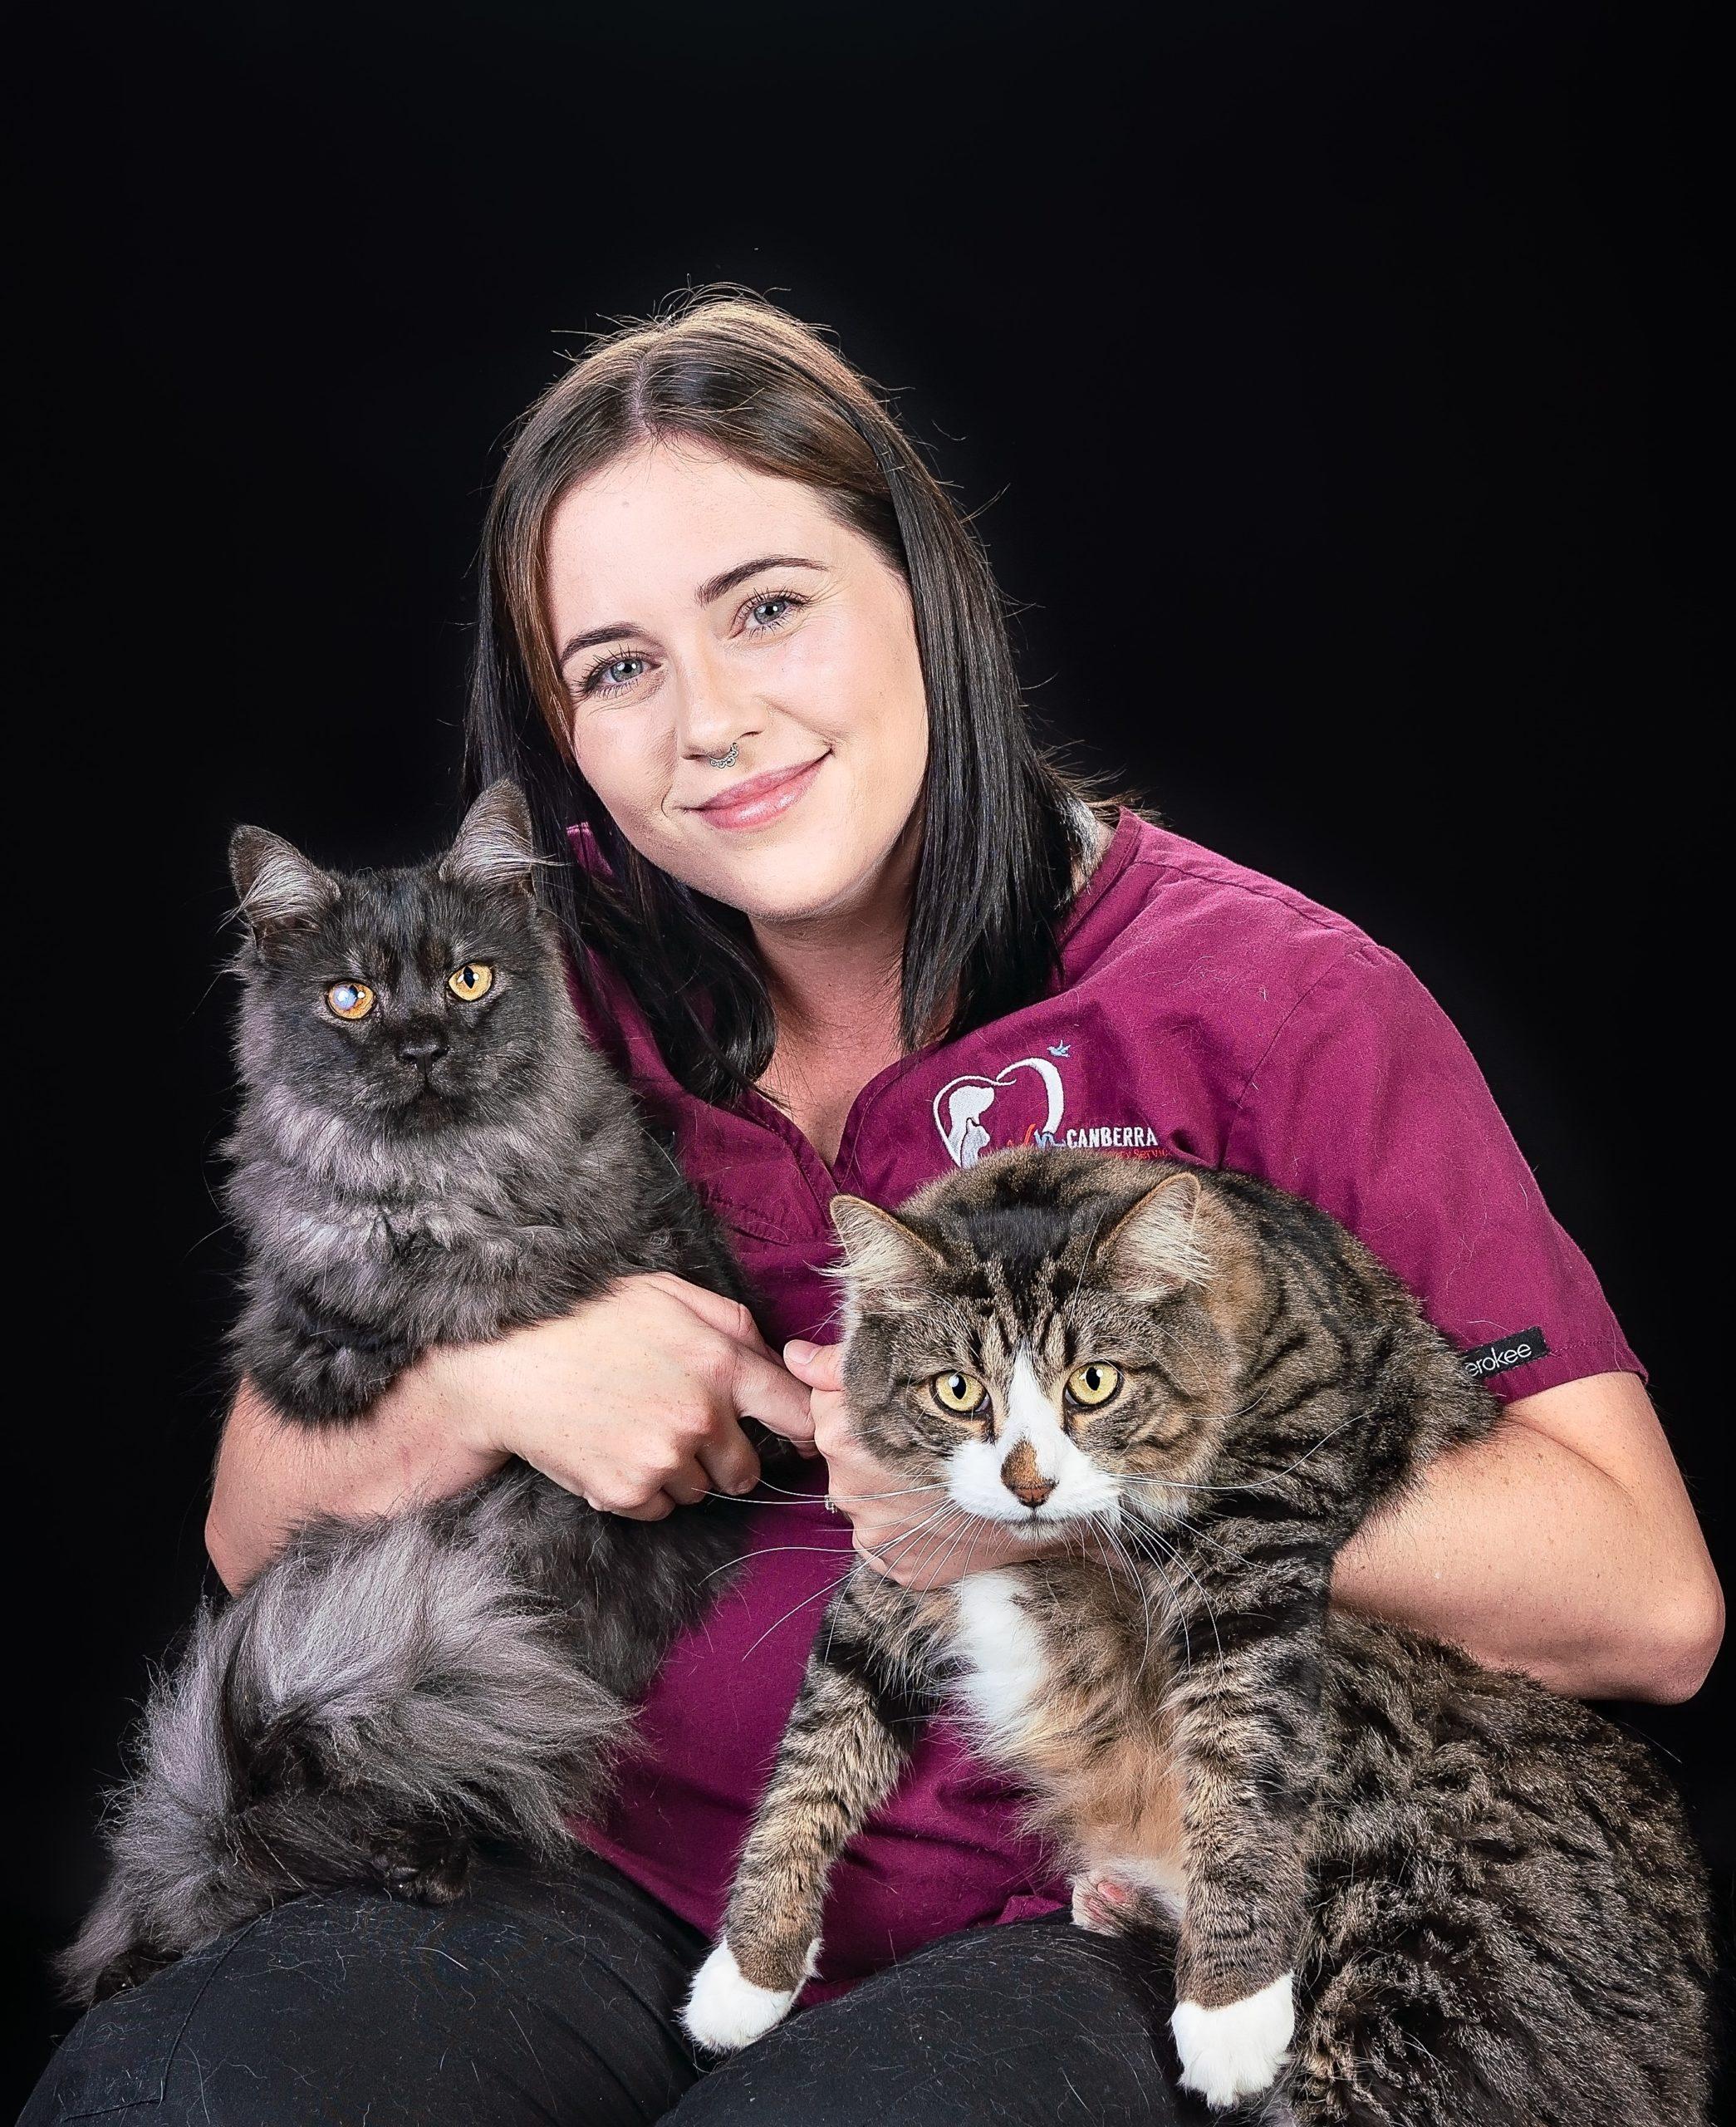 Vet Nurse Skye holding 2 cats